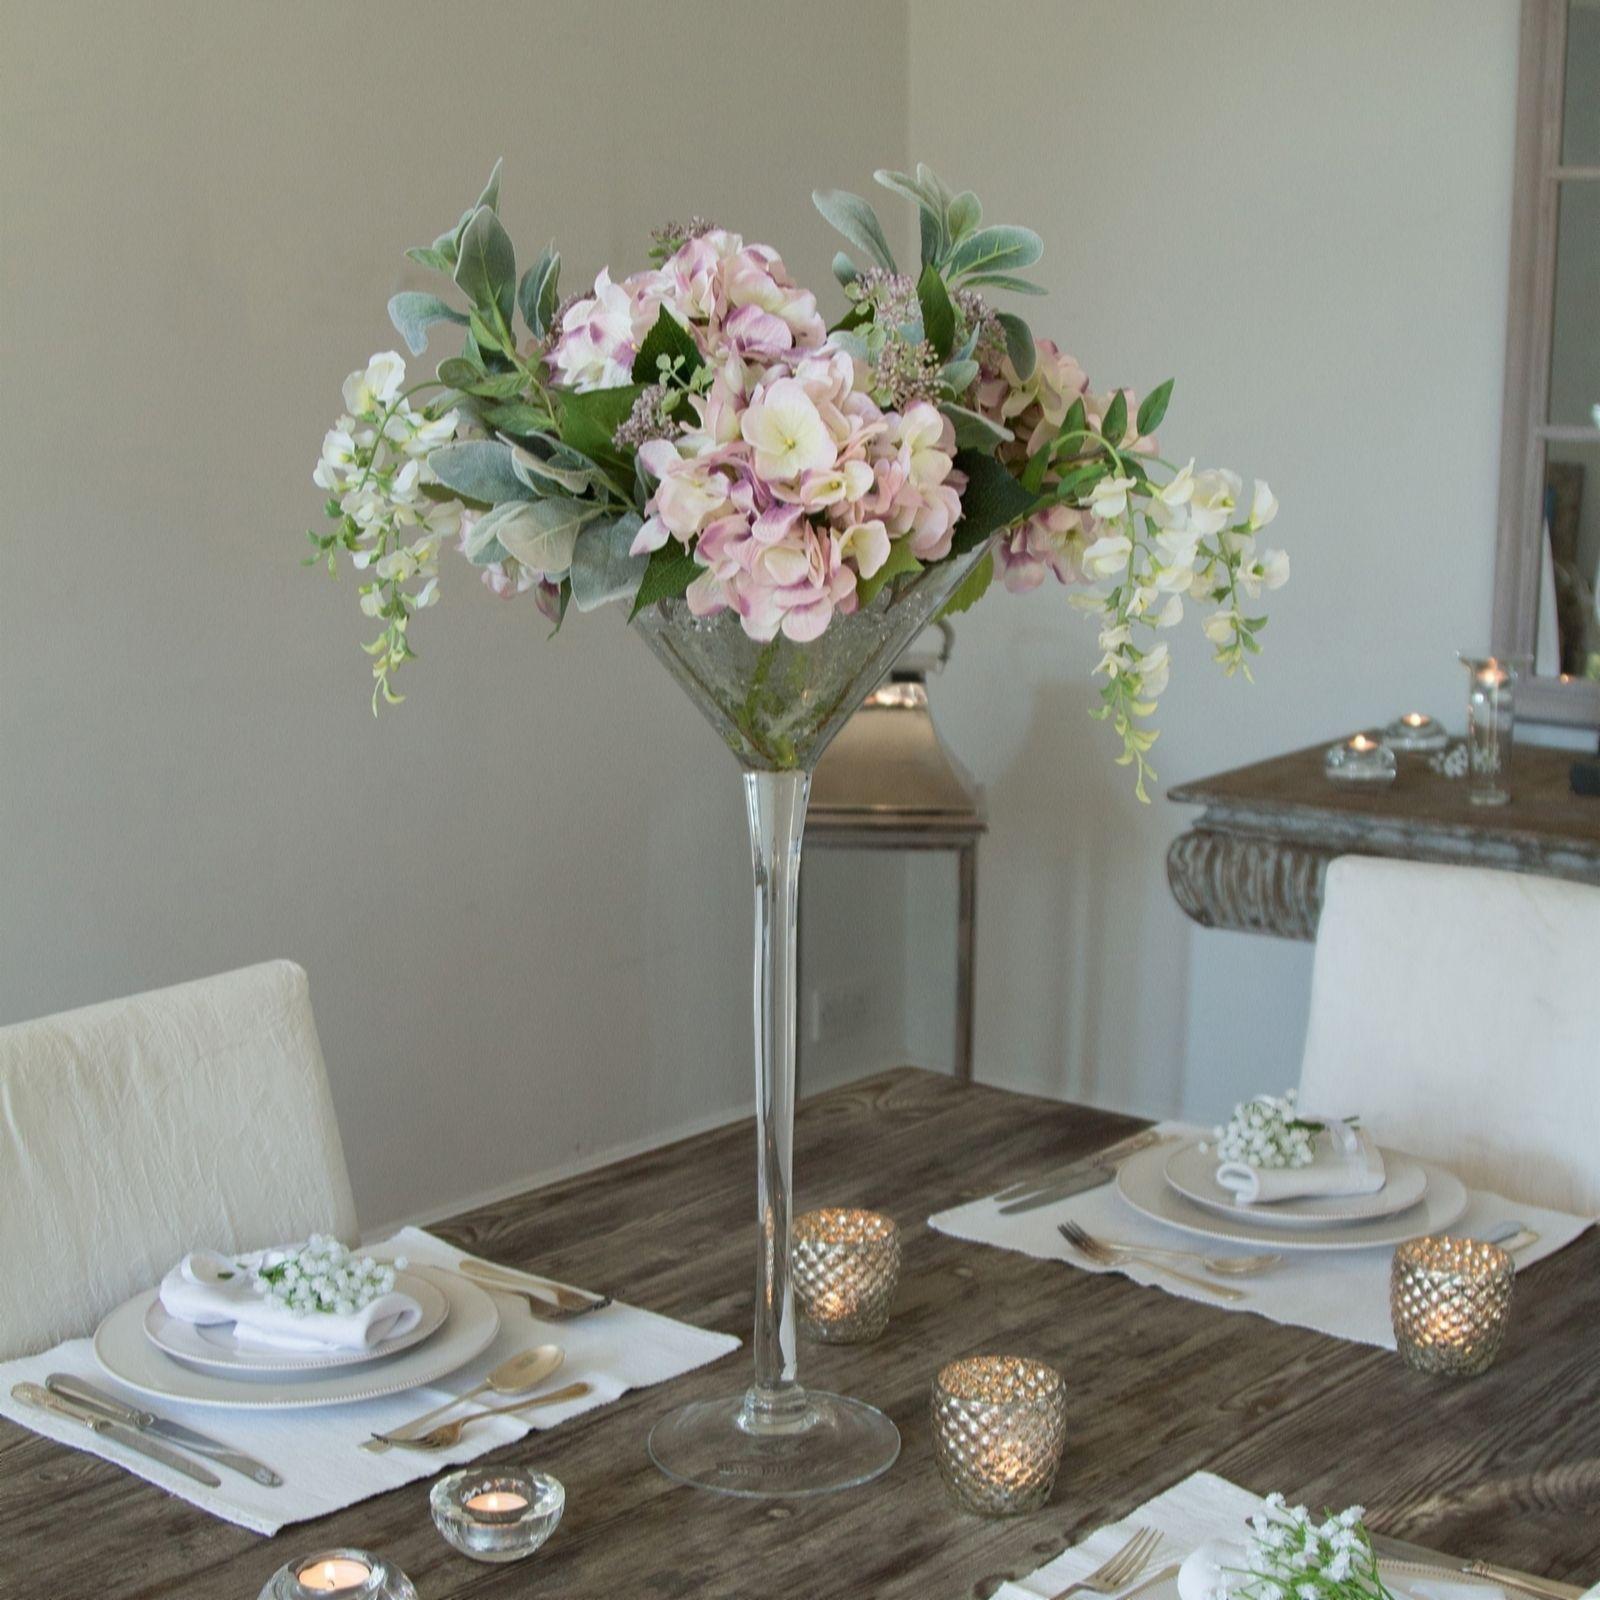 Peony Hydrangeas Lambs Ear Leaf & Wisteria in a Martini Vase QVC UK